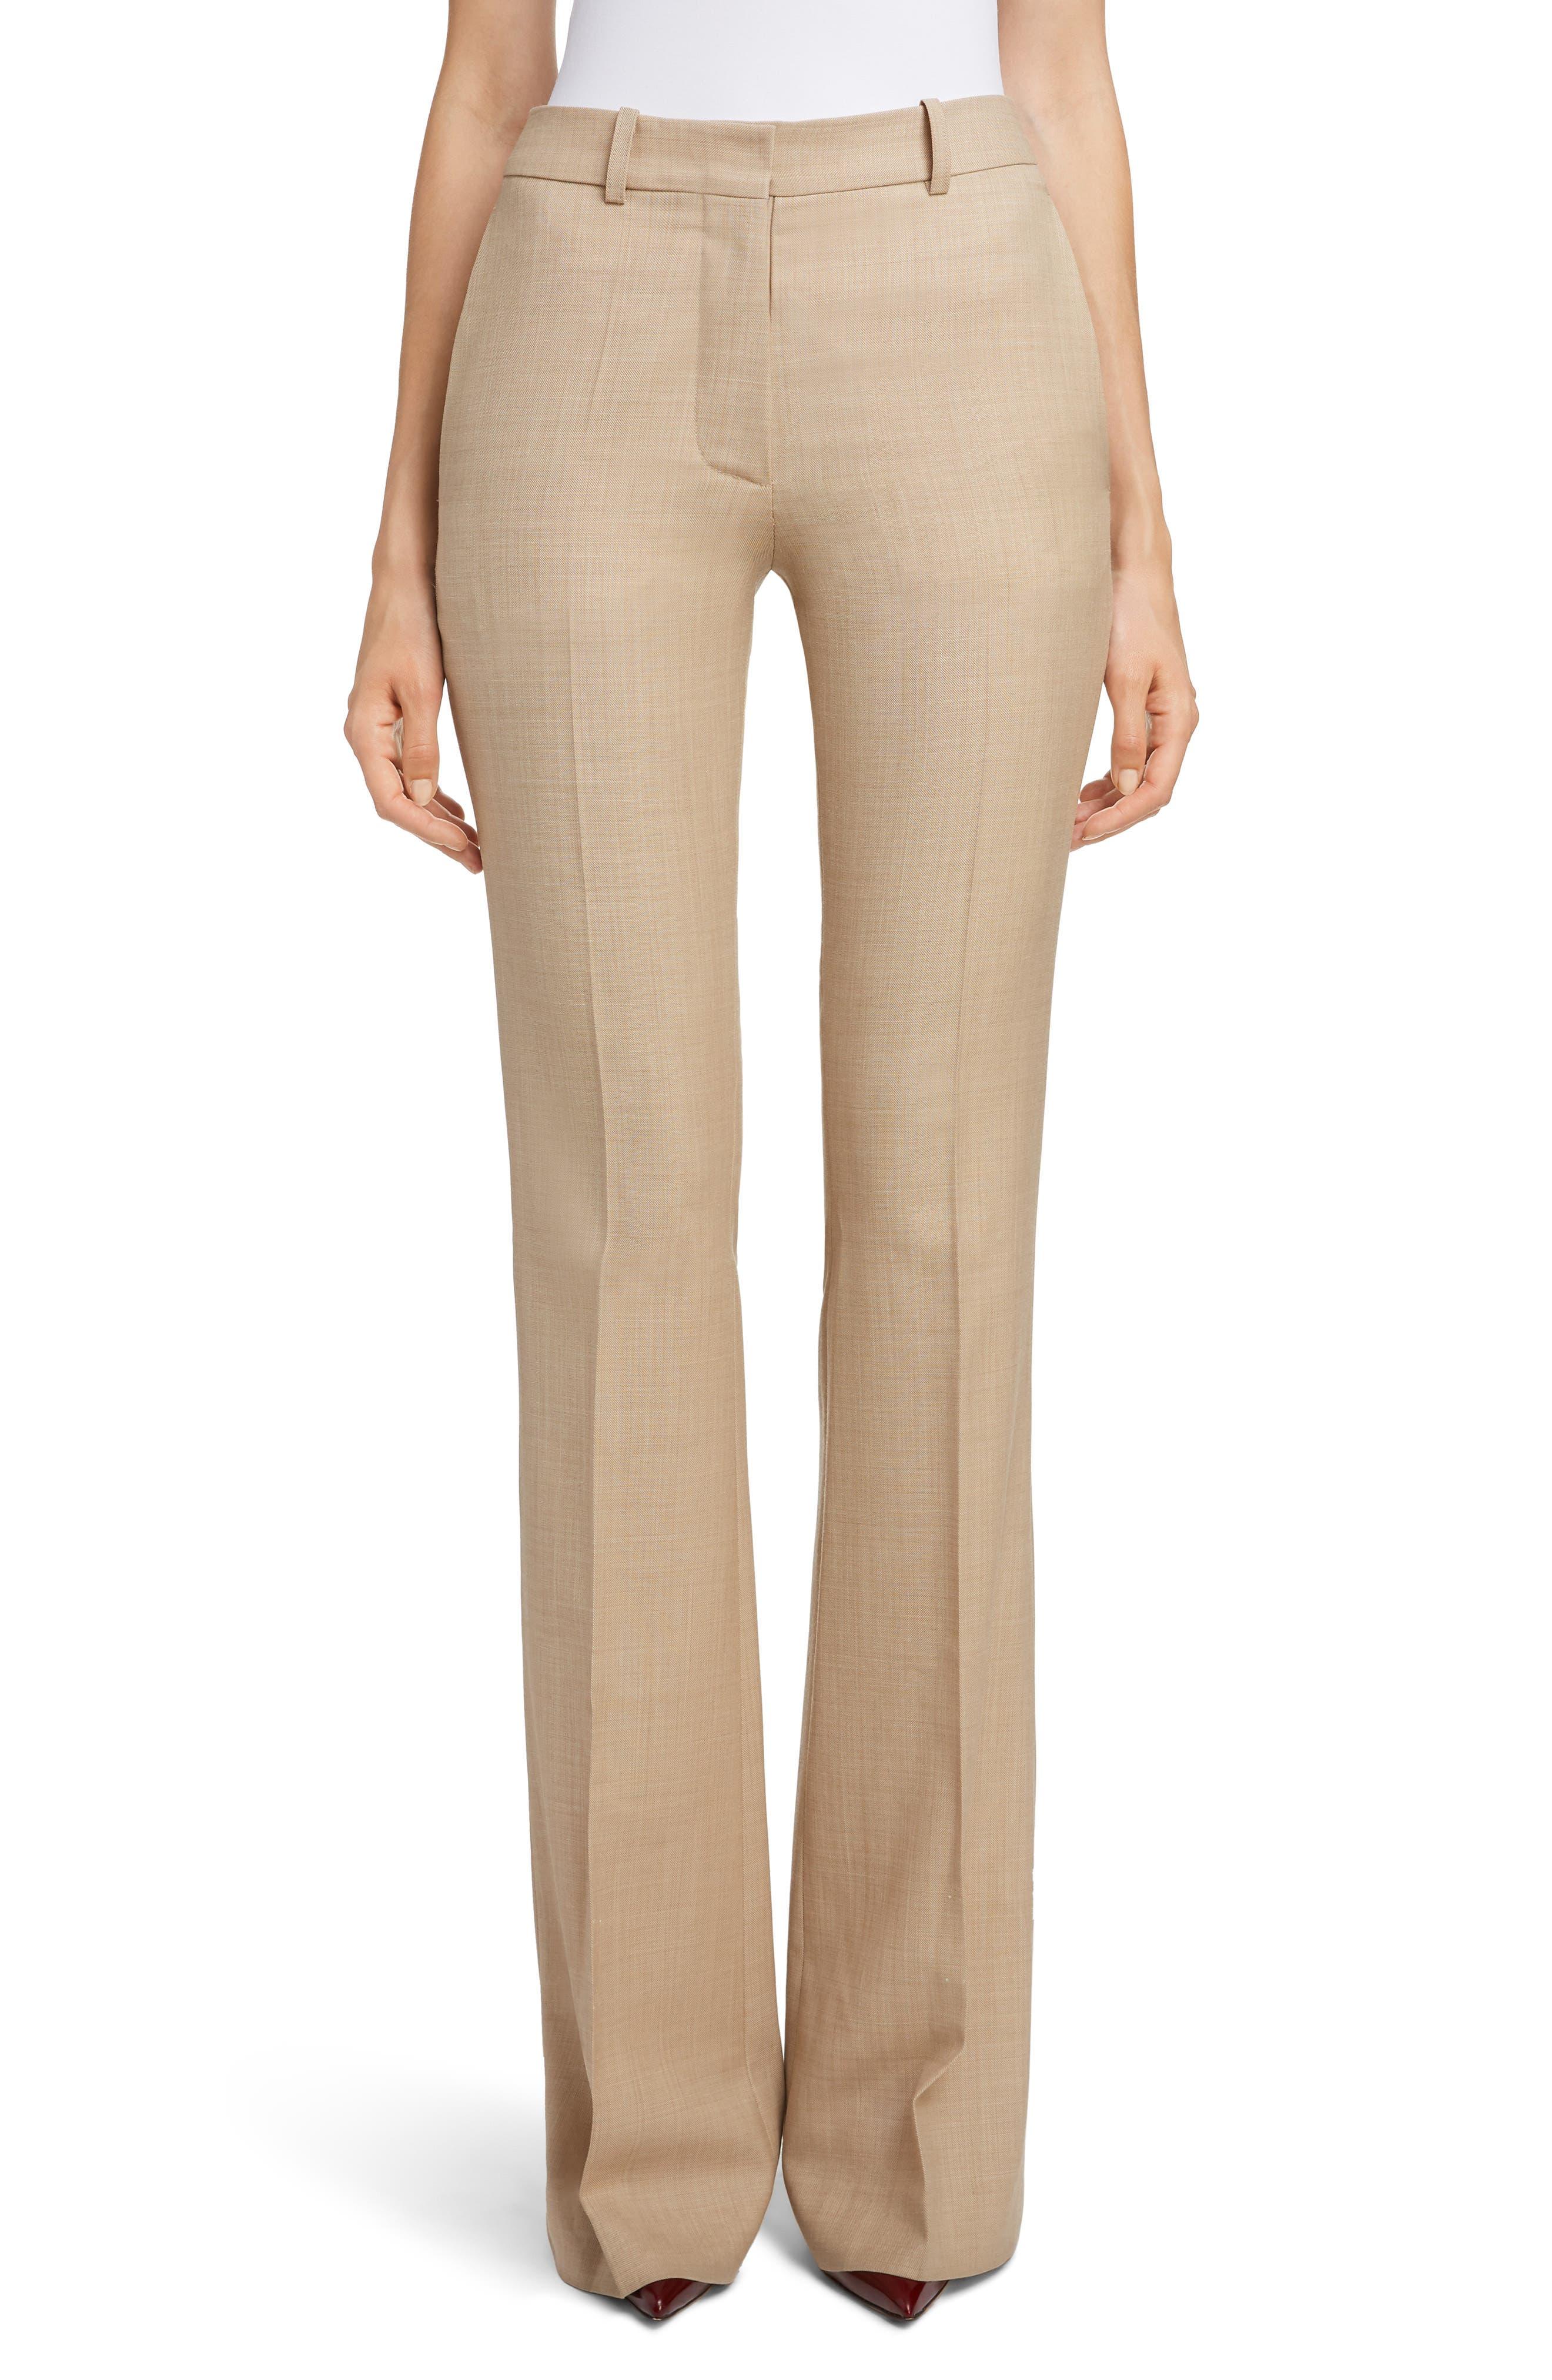 Victoria Beckham High Waist Flare Wool Pants, US / 14 UK - Beige